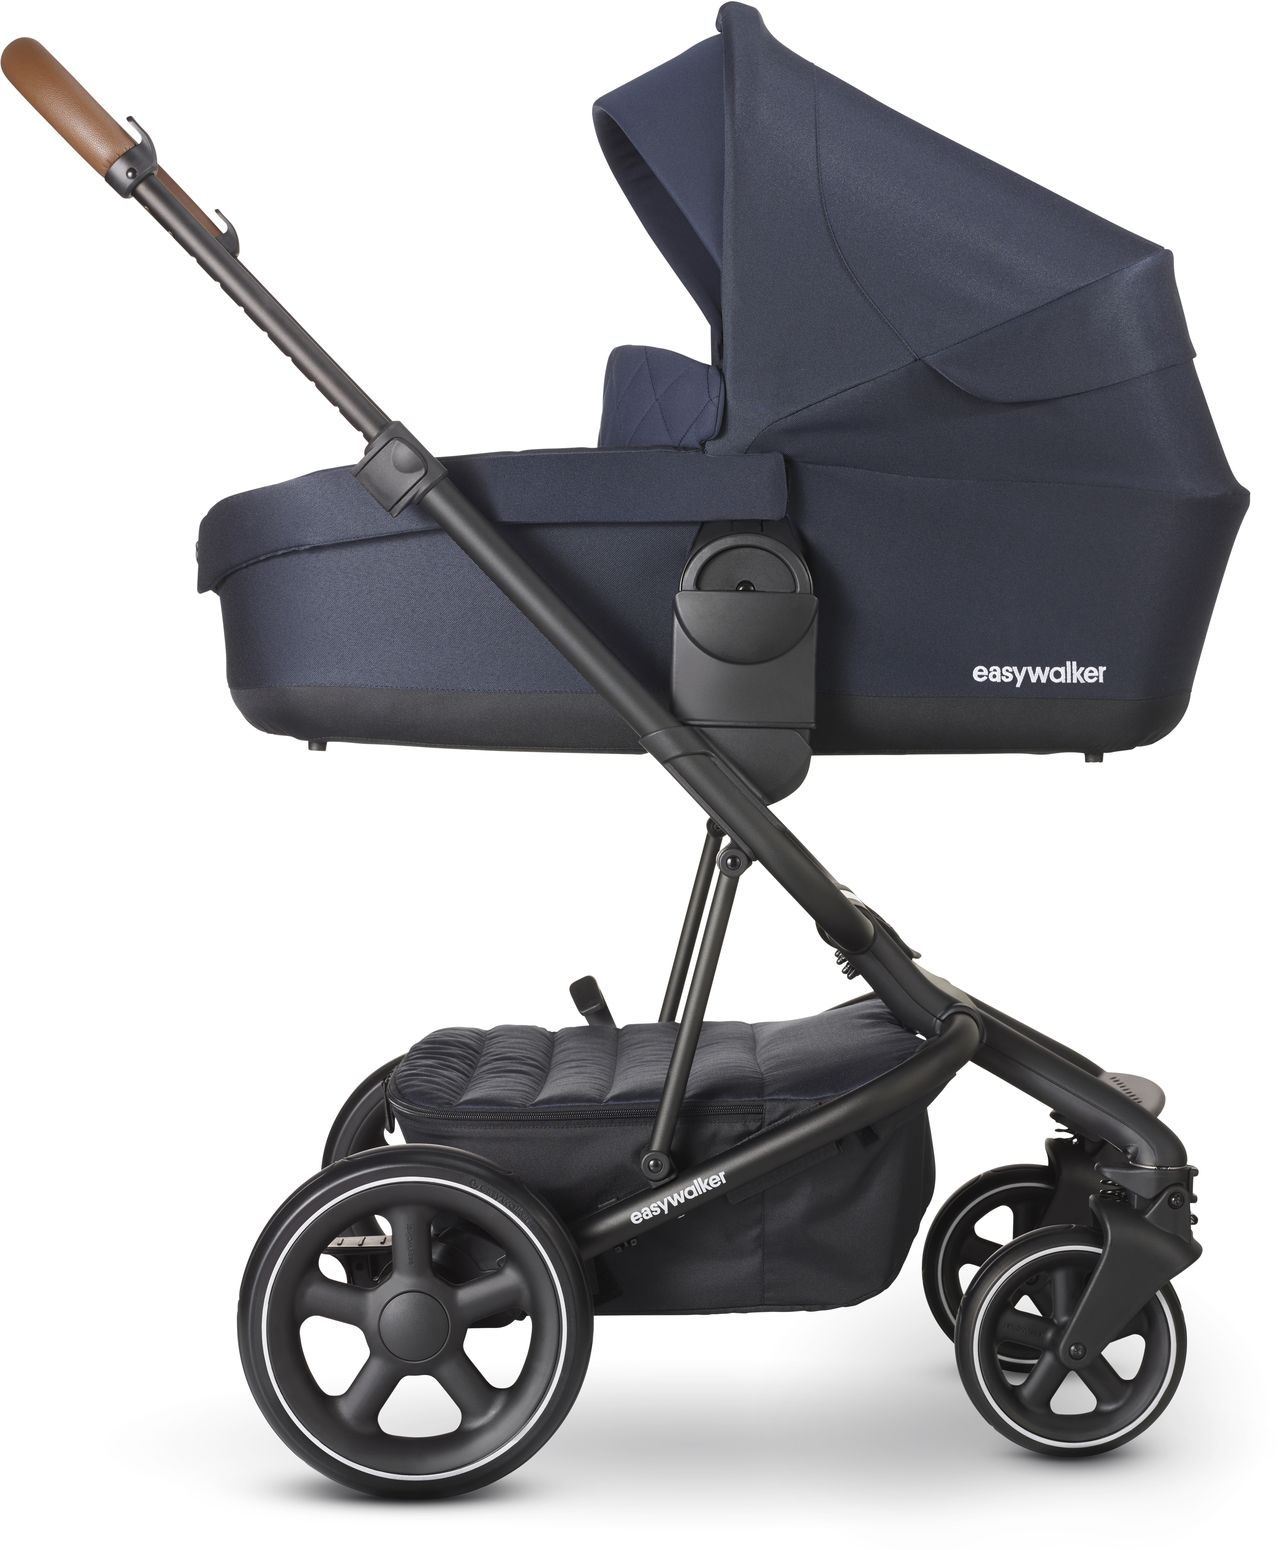 Easywalker Harvey 2 Premium Kinderwagen in Berlin kaufen - Kleine Fabriek